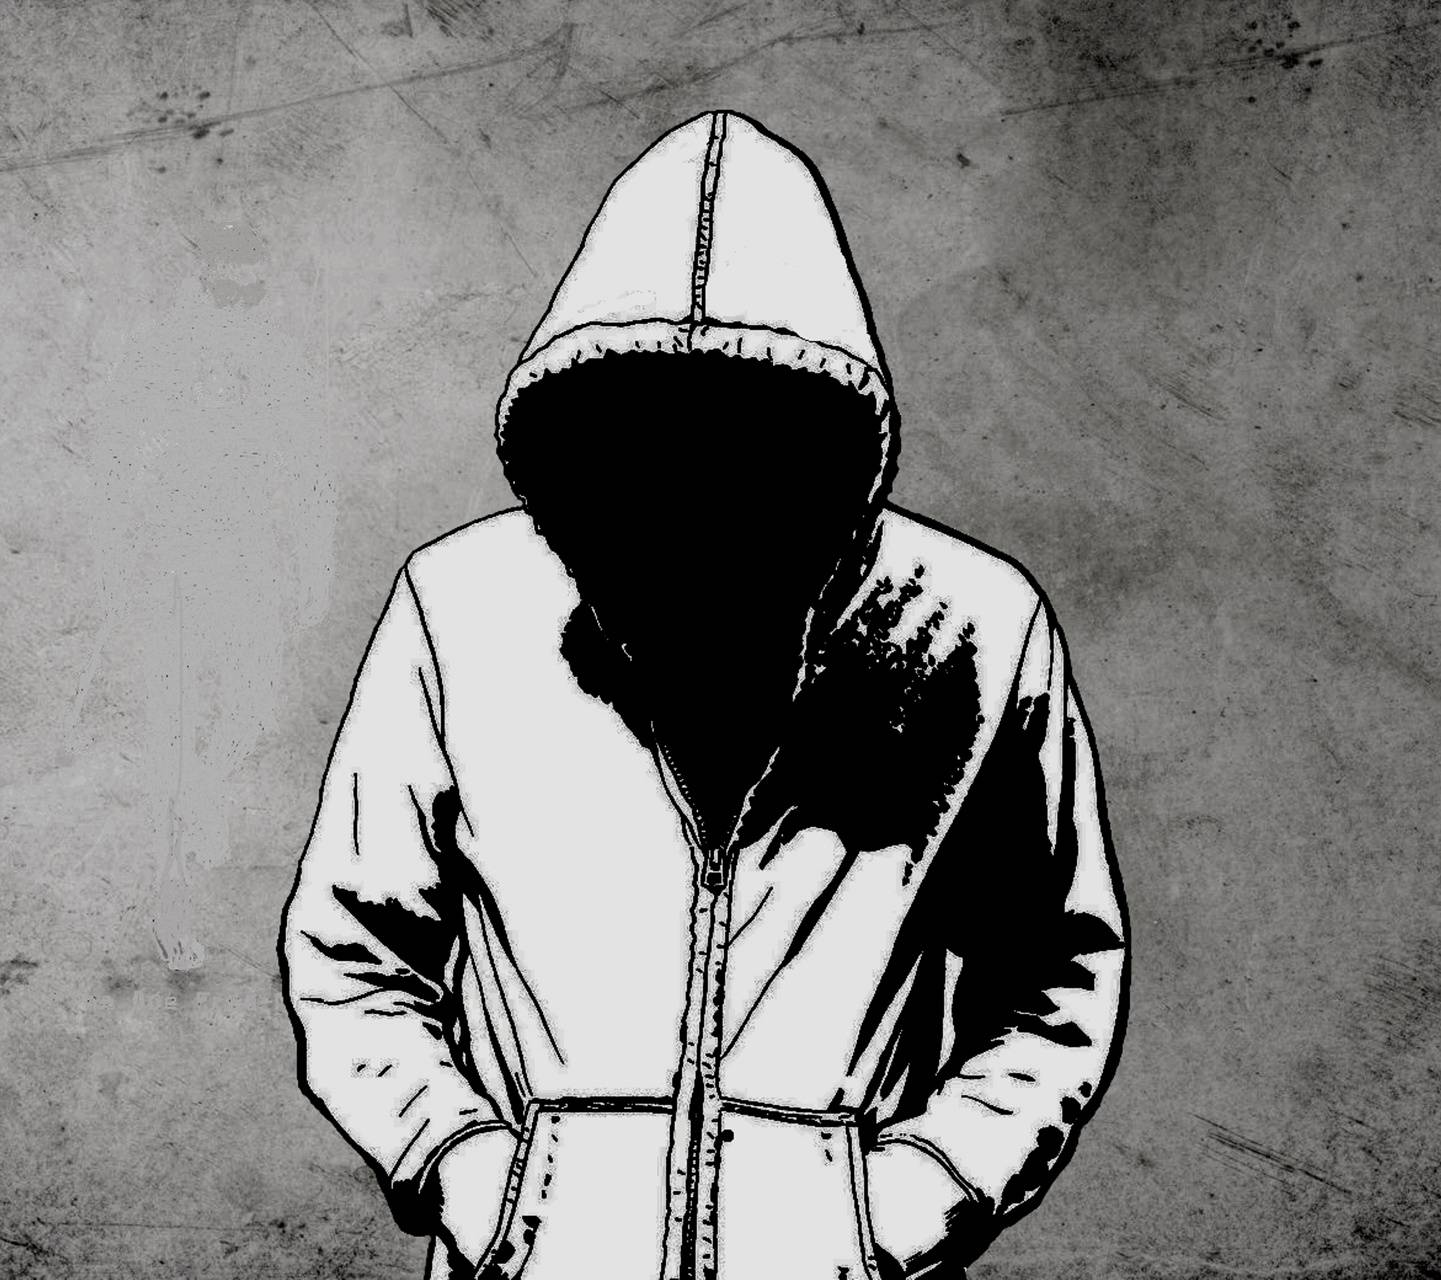 Hoodie Graffiti